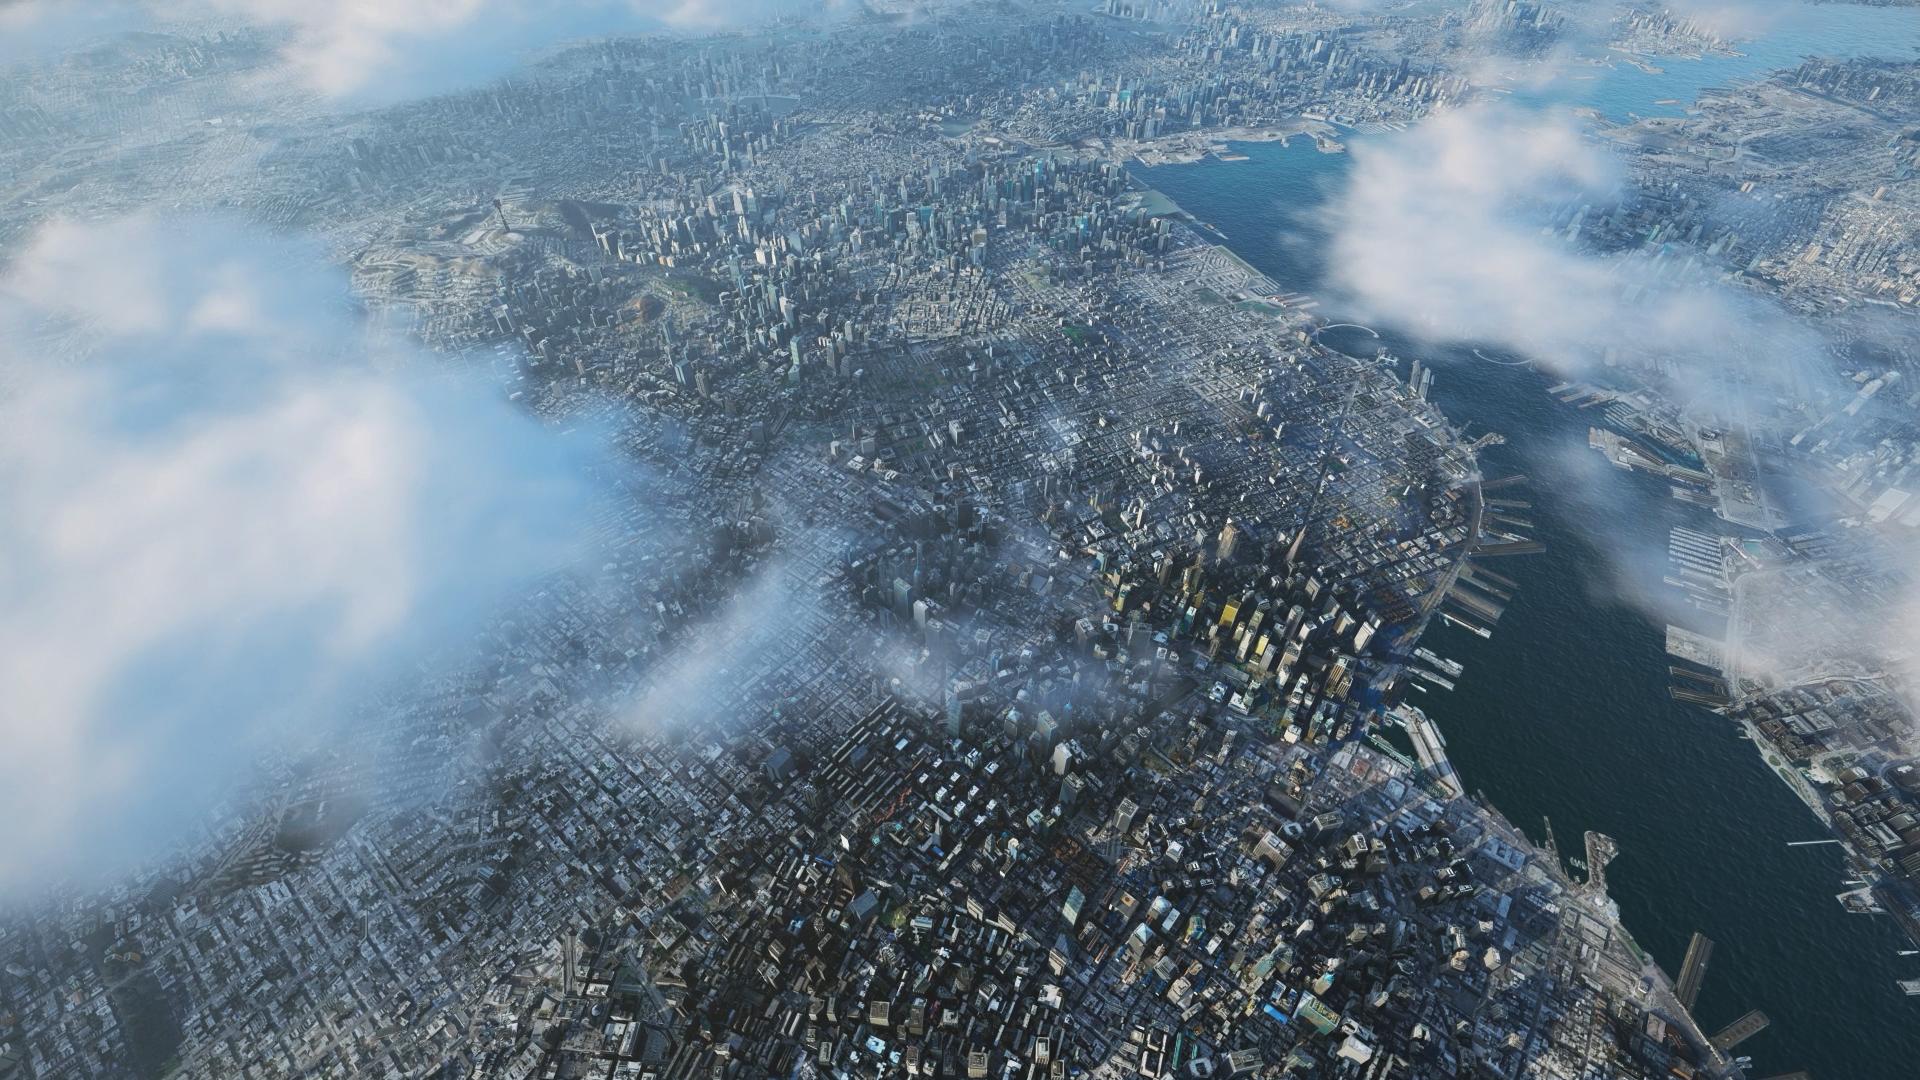 Aedas City, bird's-eye view. Rendered in Lumion 11 by Beehive. Architectural designs by Aedas.